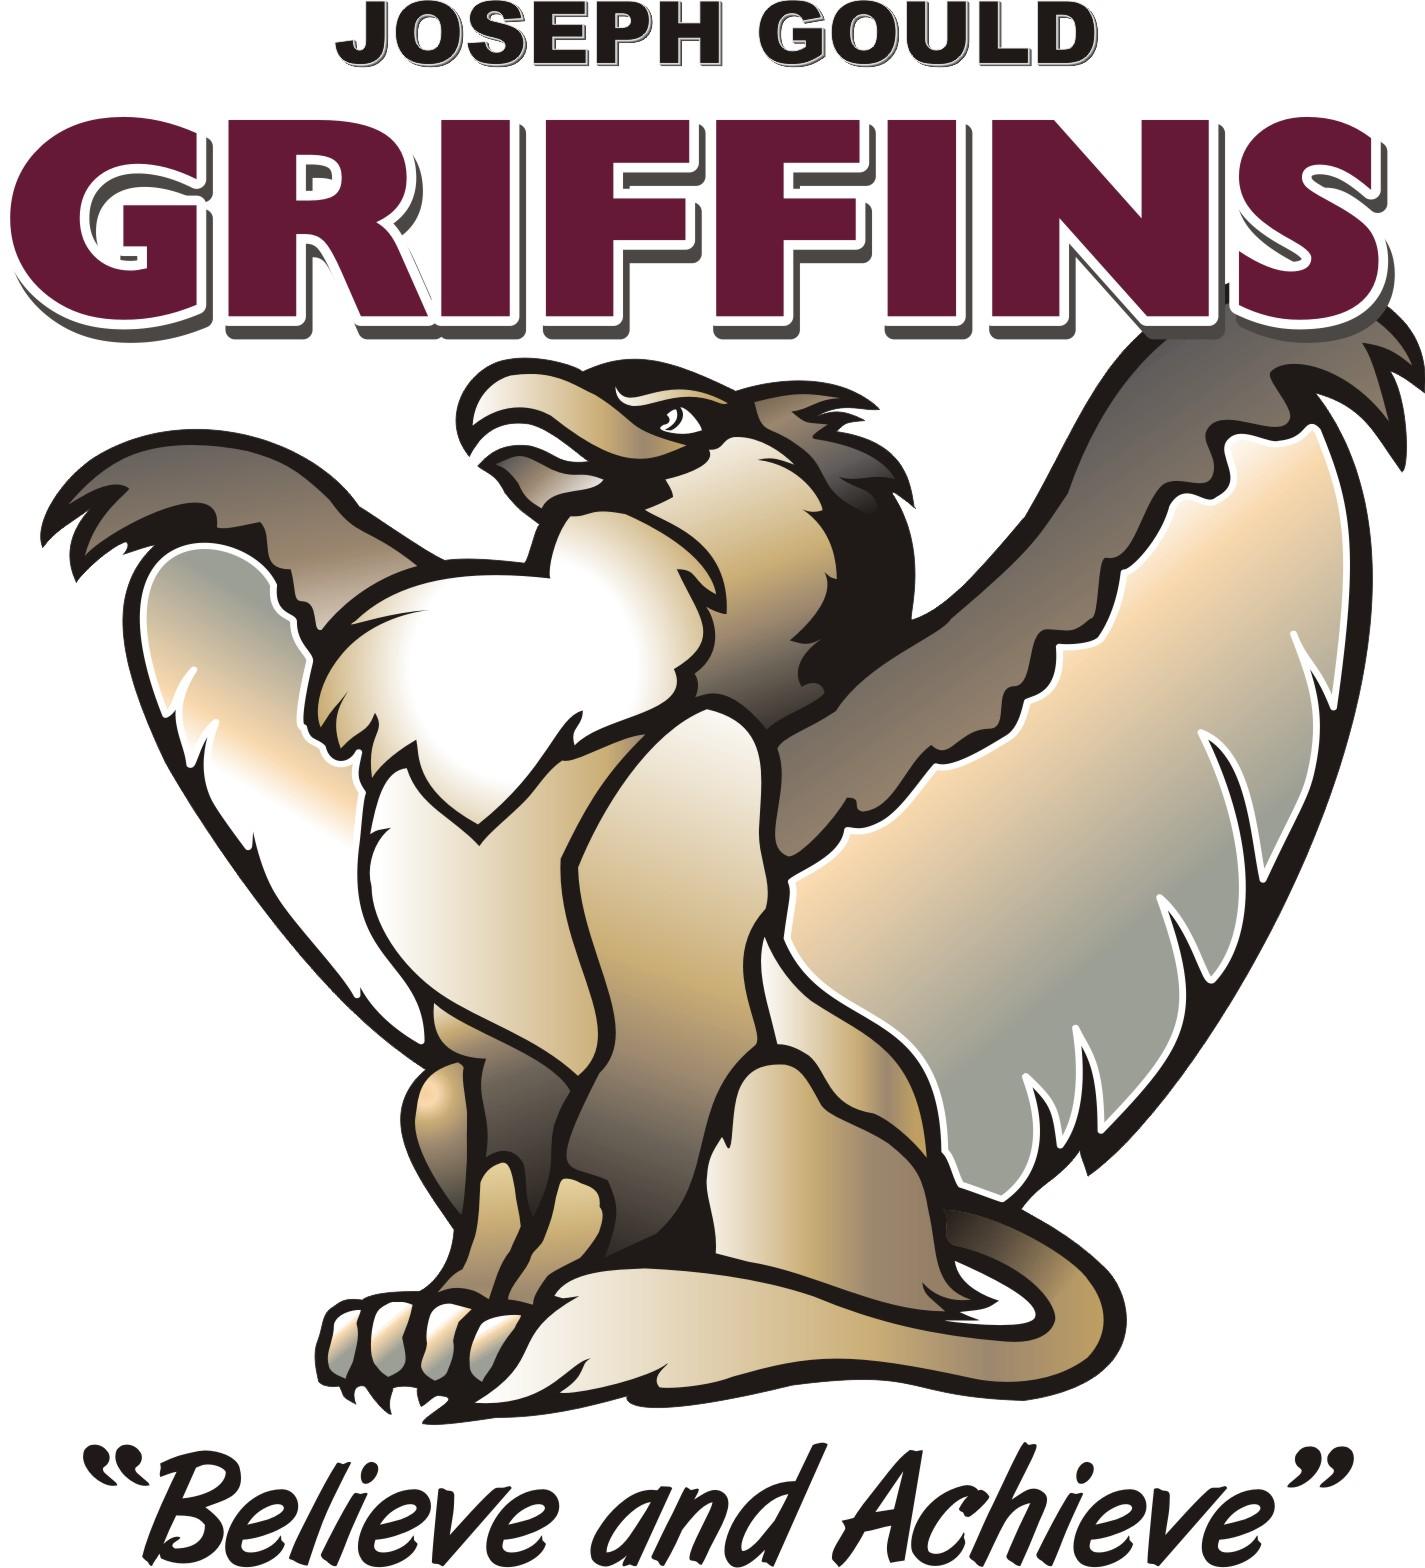 Joseph Gould Public School logo